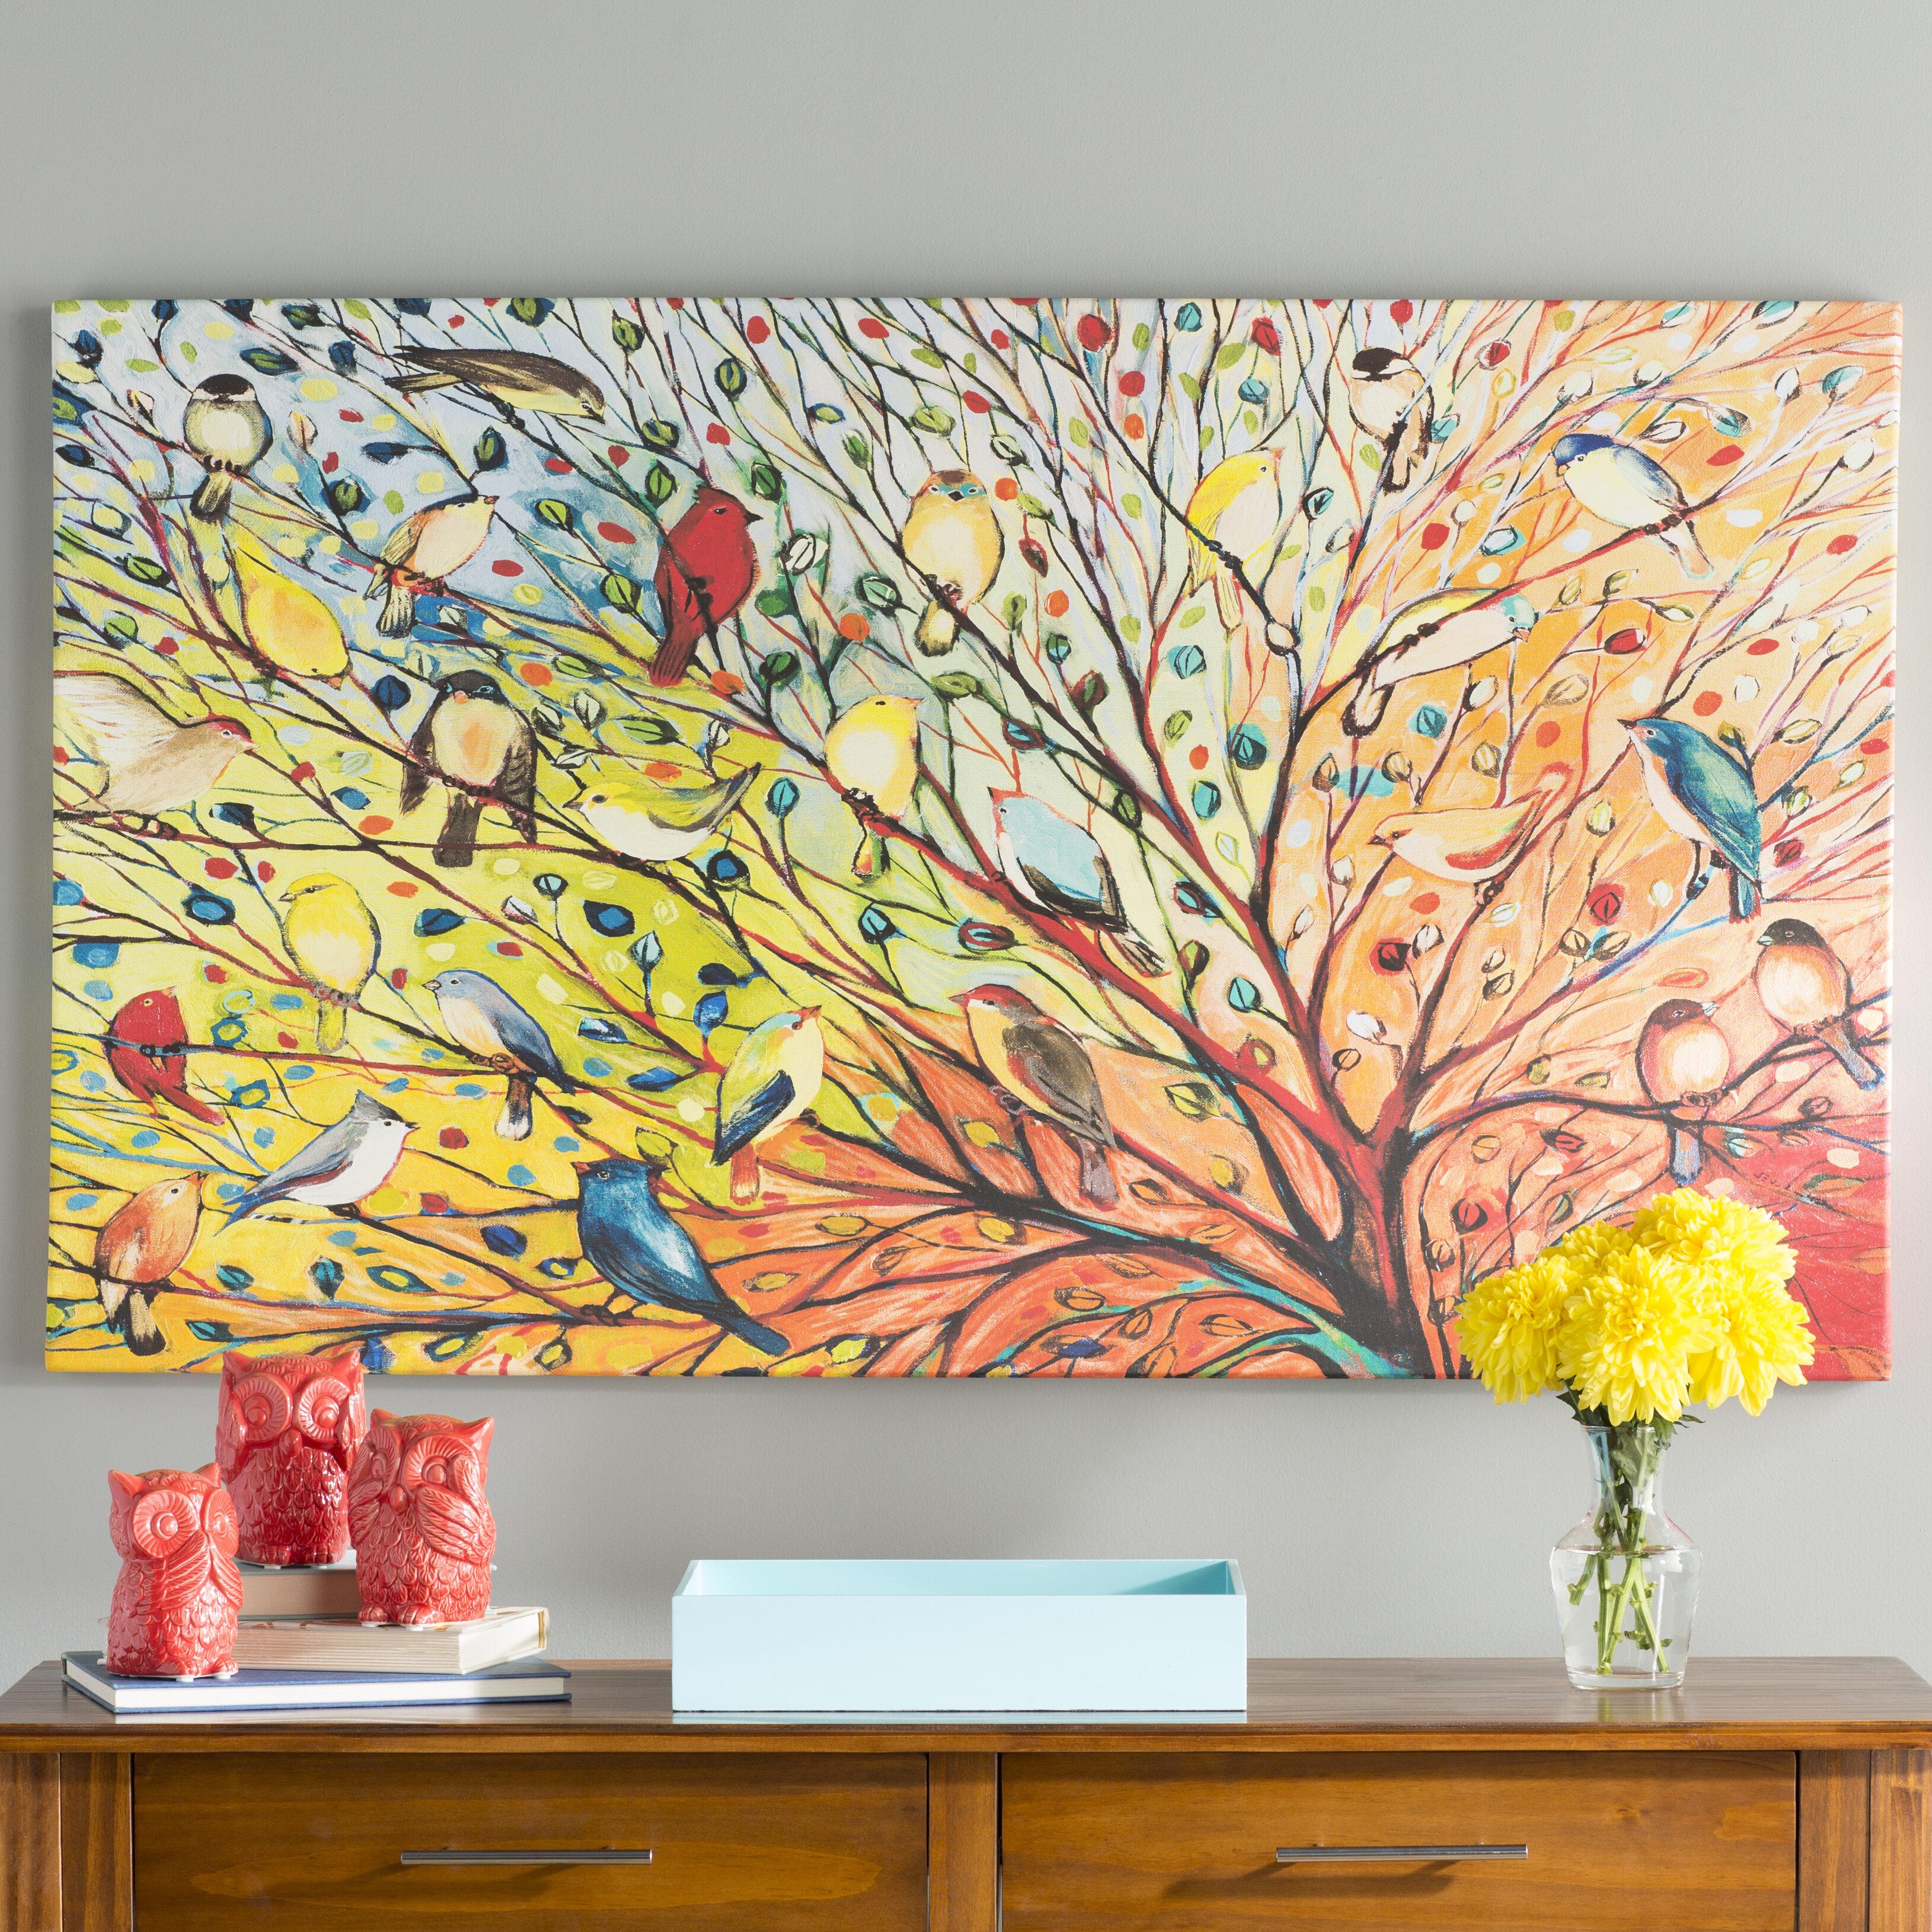 Carolines Treasures Watercolor Apples and Polka dots Wall Hook Triple Multicolor